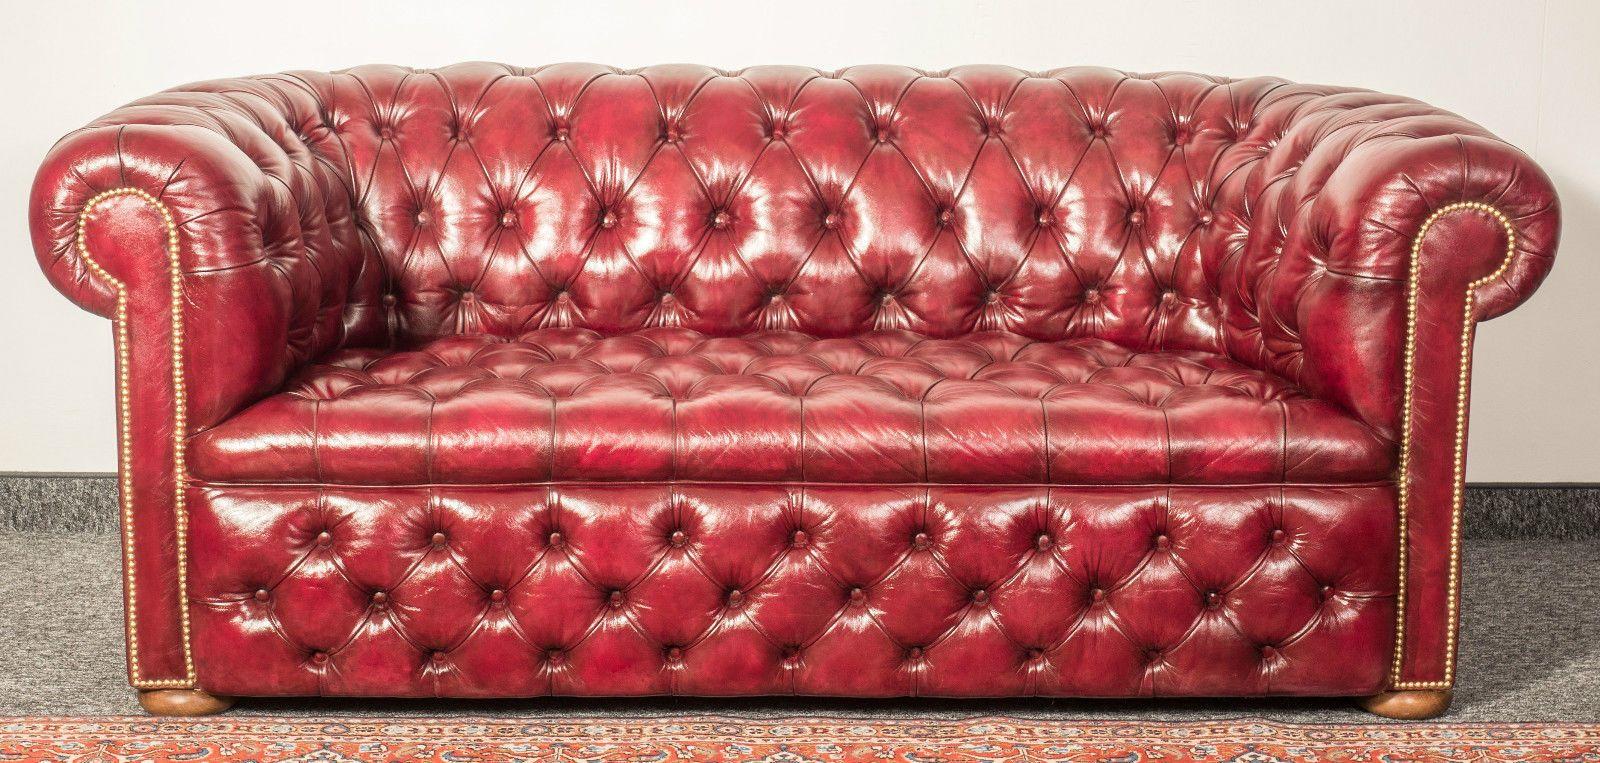 chesterfield sofa ebay tank pinterest chesterfield sofa